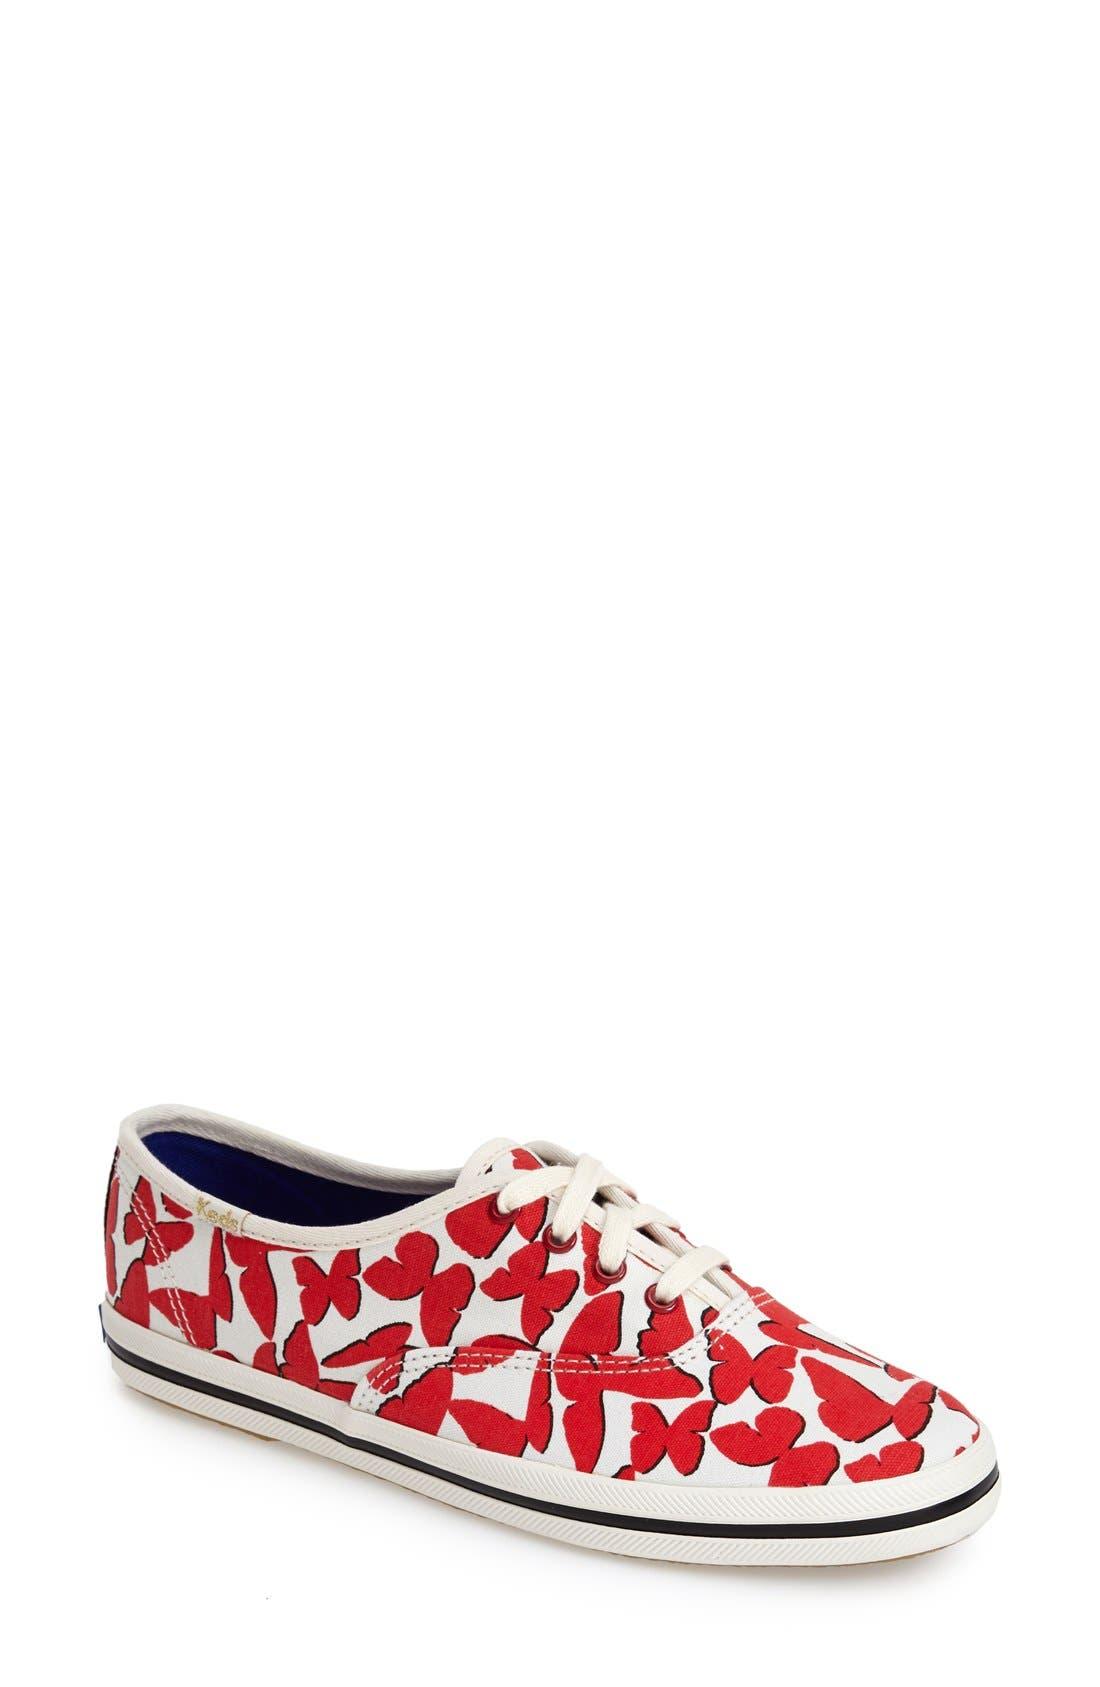 Alternate Image 1 Selected - Keds® for kate spade new york 'kick' sneaker (Women)